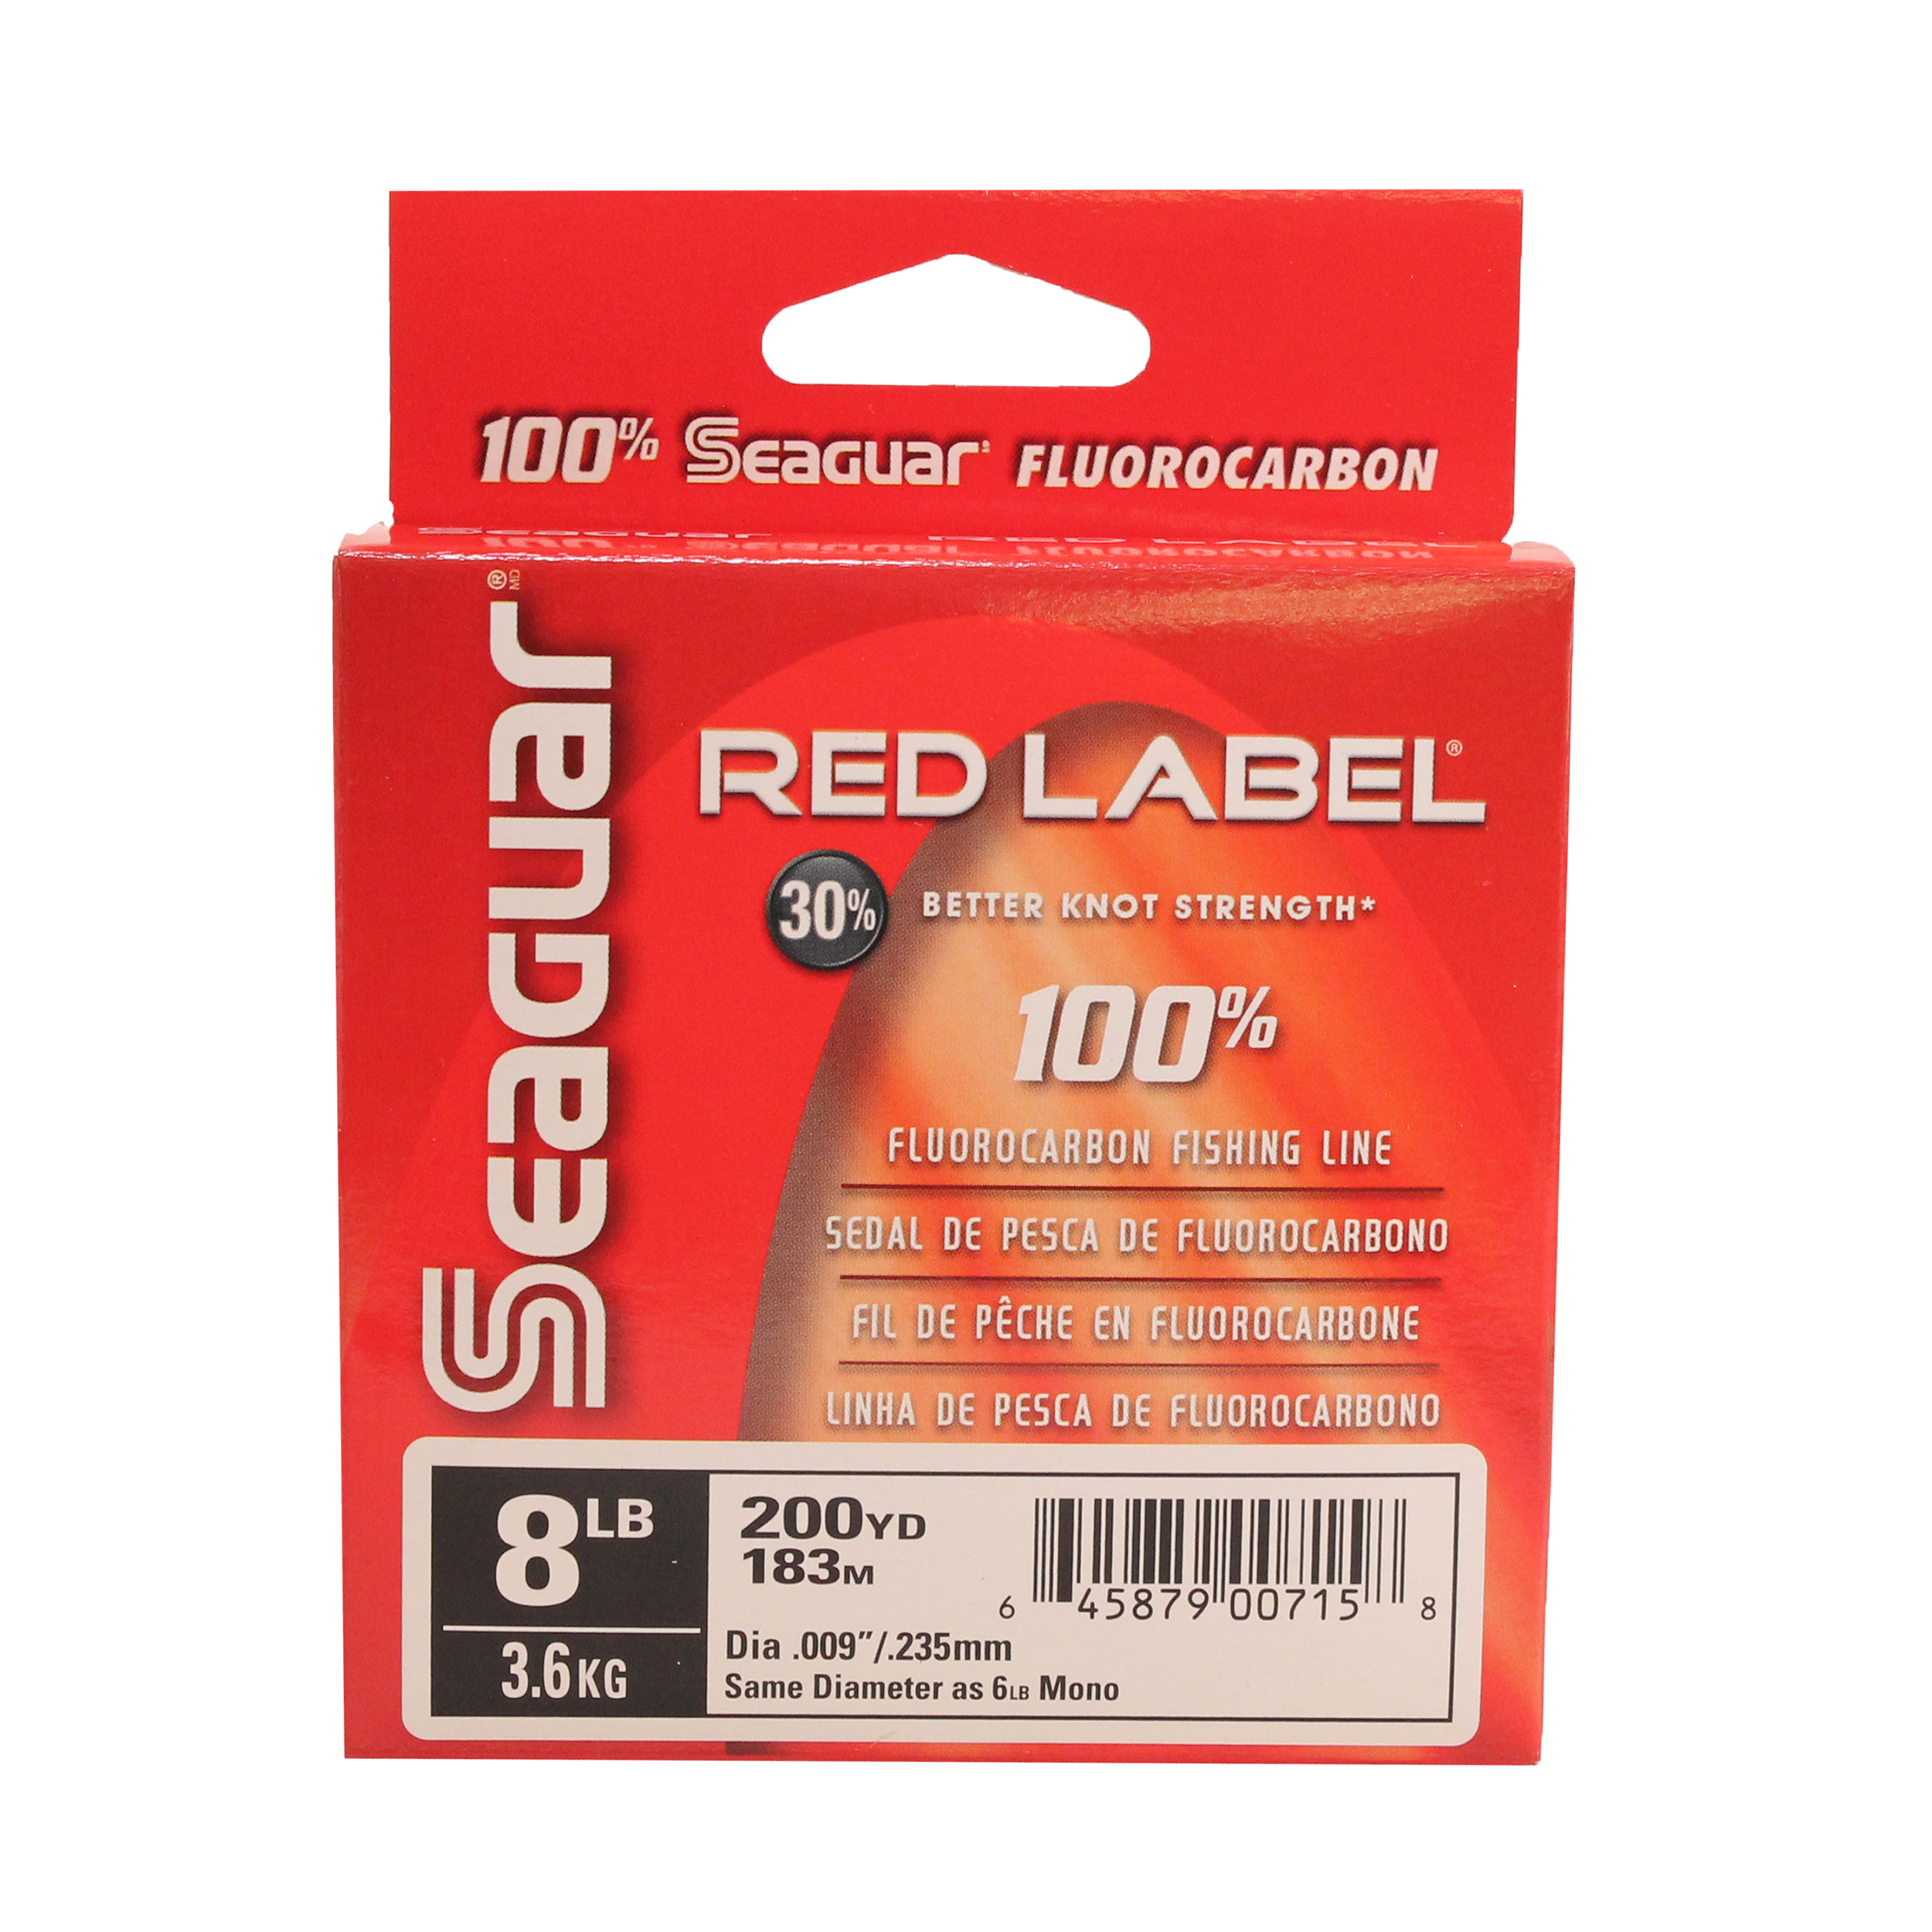 Seaguar Red Label 100% Fluoro 200yd 10lb 10RM250 - Walmart.com